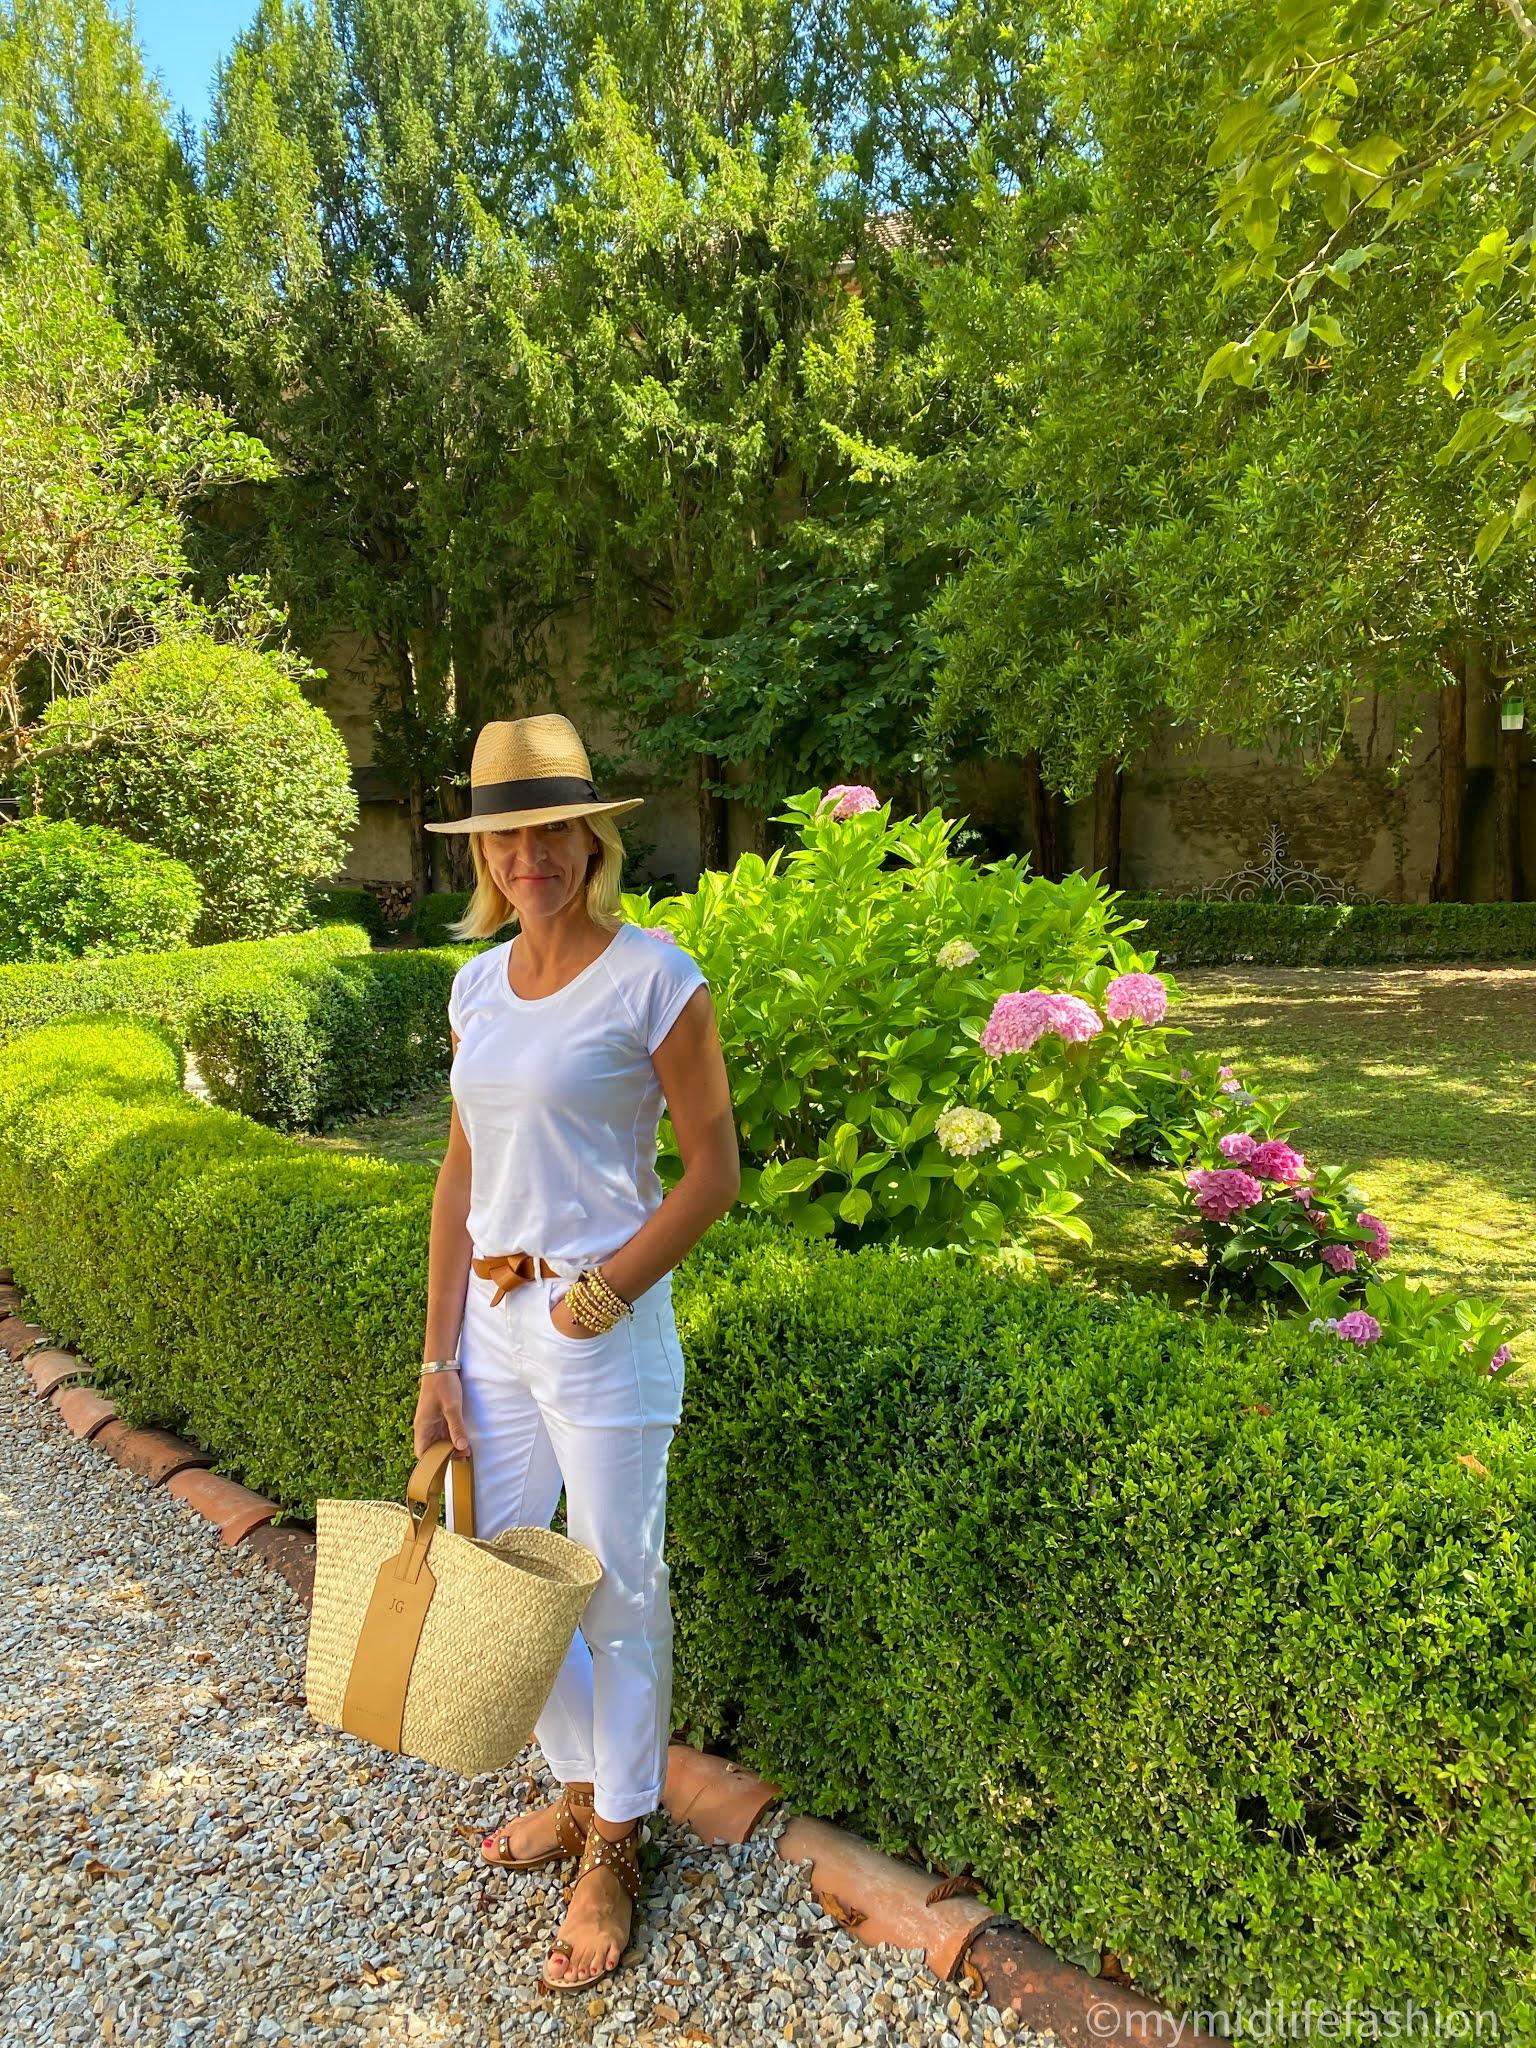 my midlife fashion, Baukjen the organic boyfriend jean, Baukjen Catherine top, rae feather grace basket, h and m Panama hat, Isabel Marant lecce belt, basalt studded sandals